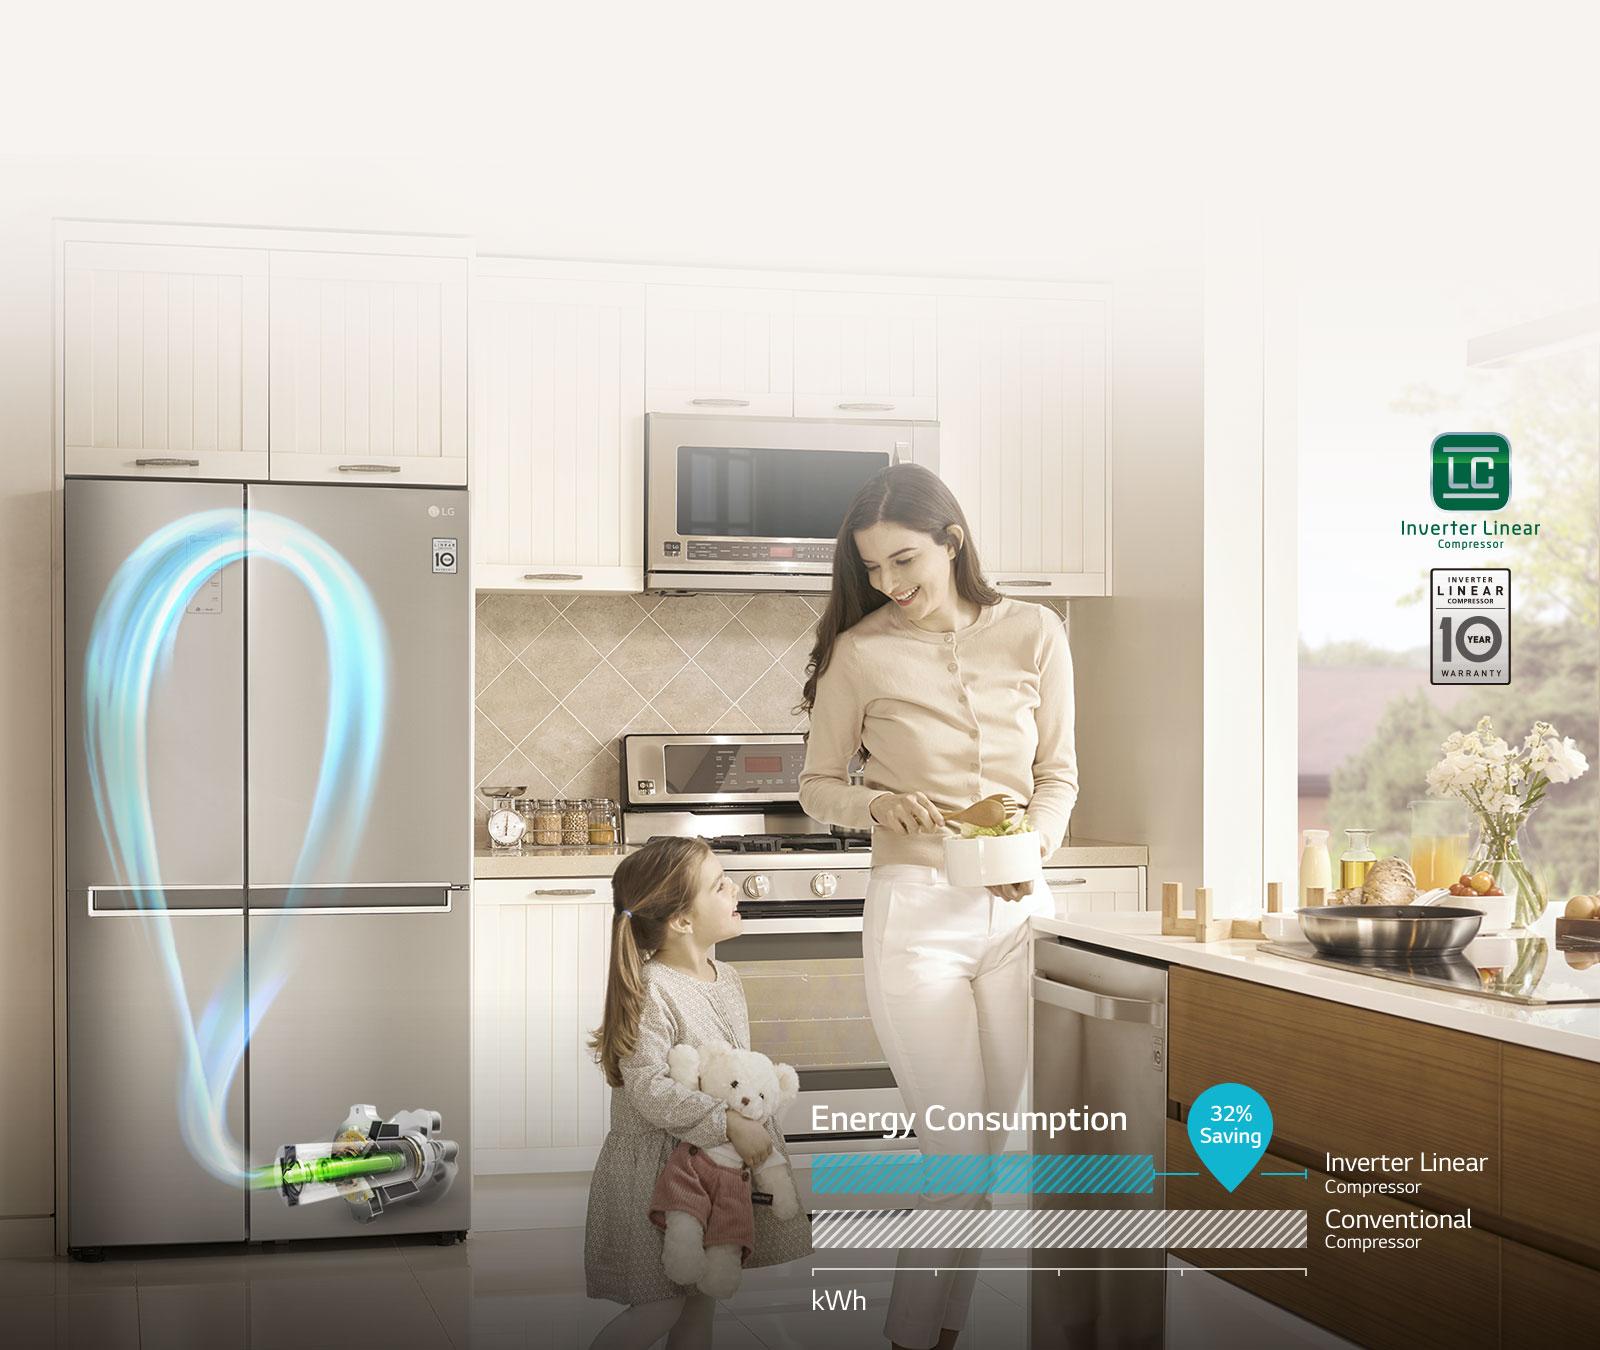 GS-B6267GV_Side-by-Side_Refrigerator_InverterLinearCompressor_D_v1